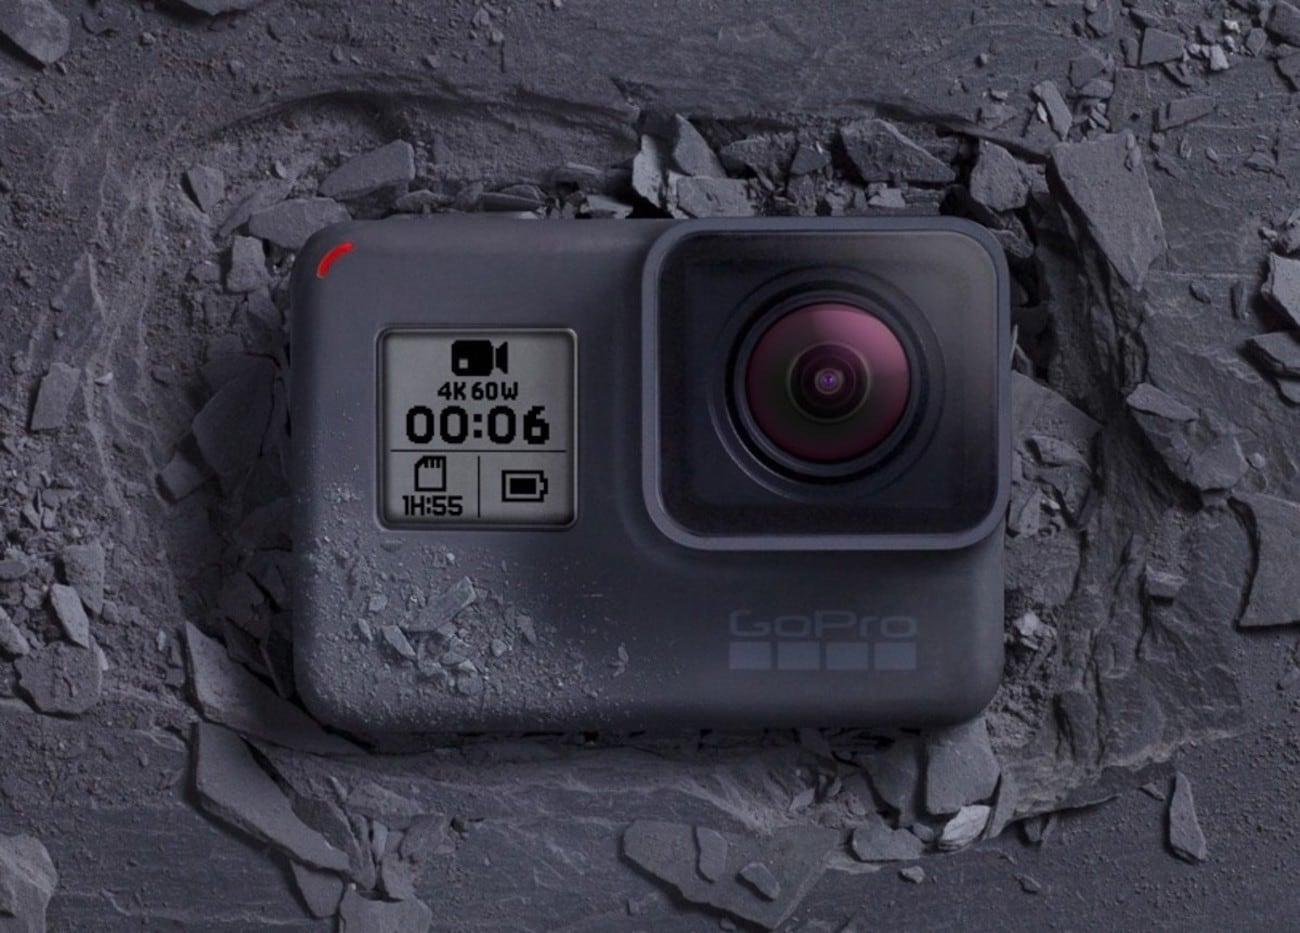 GoPro Hero6 Black Voice Control Action Camera